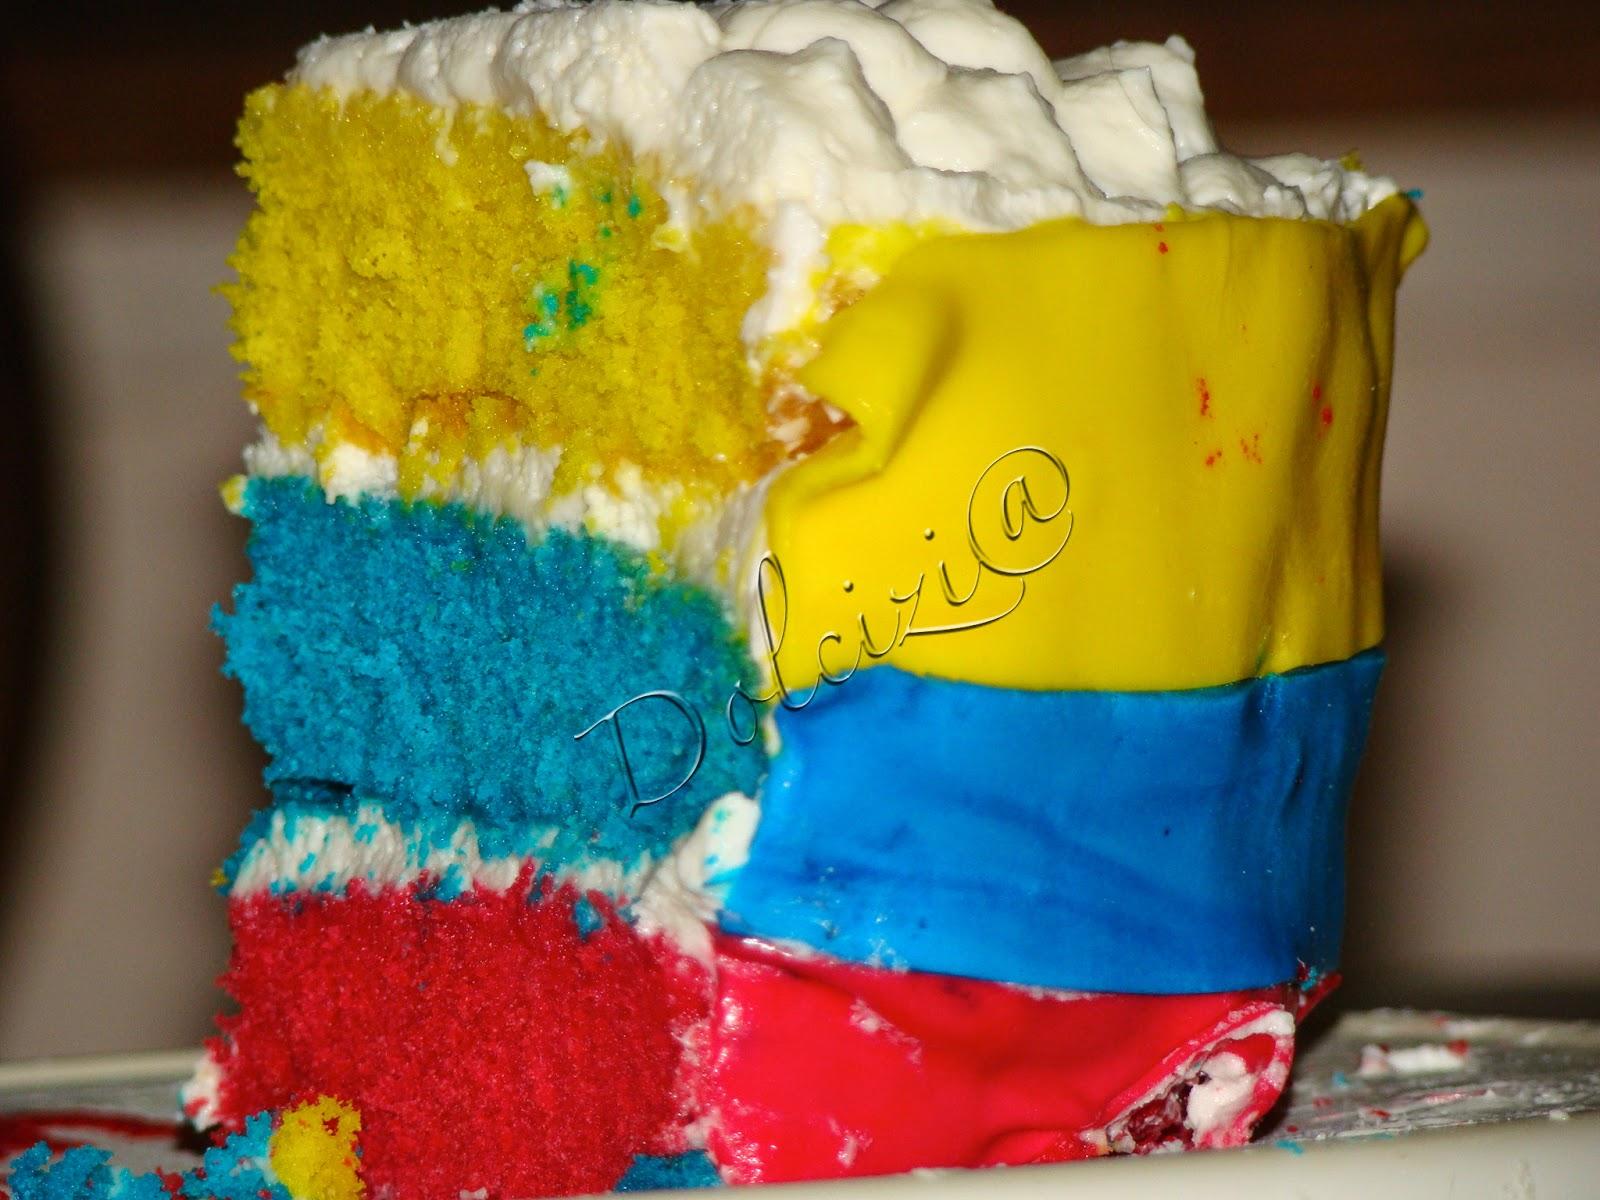 torta bandiera dell'ecuador